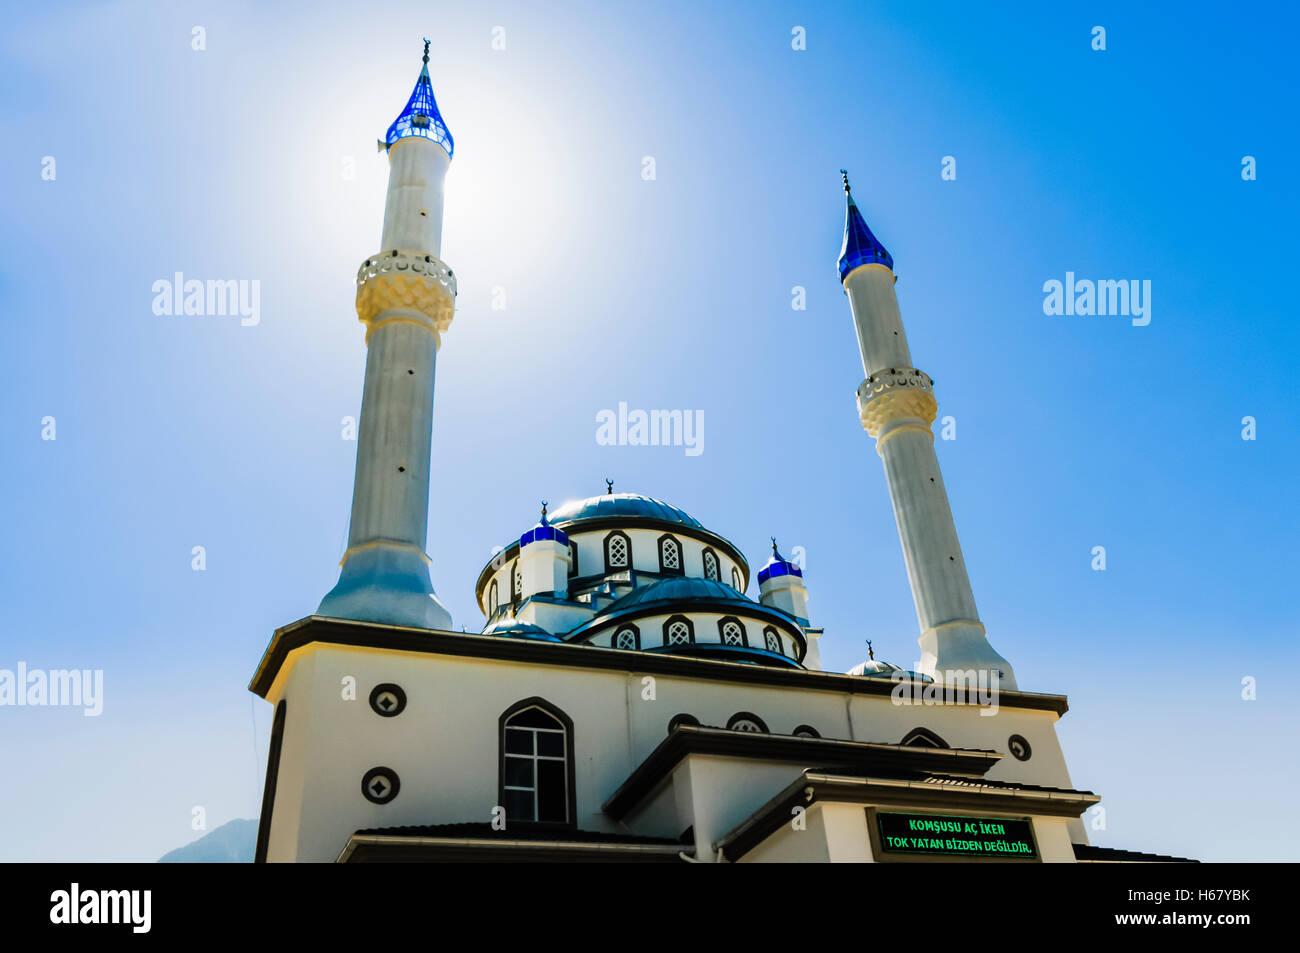 Sun Behind The Minaret Of A Mosque